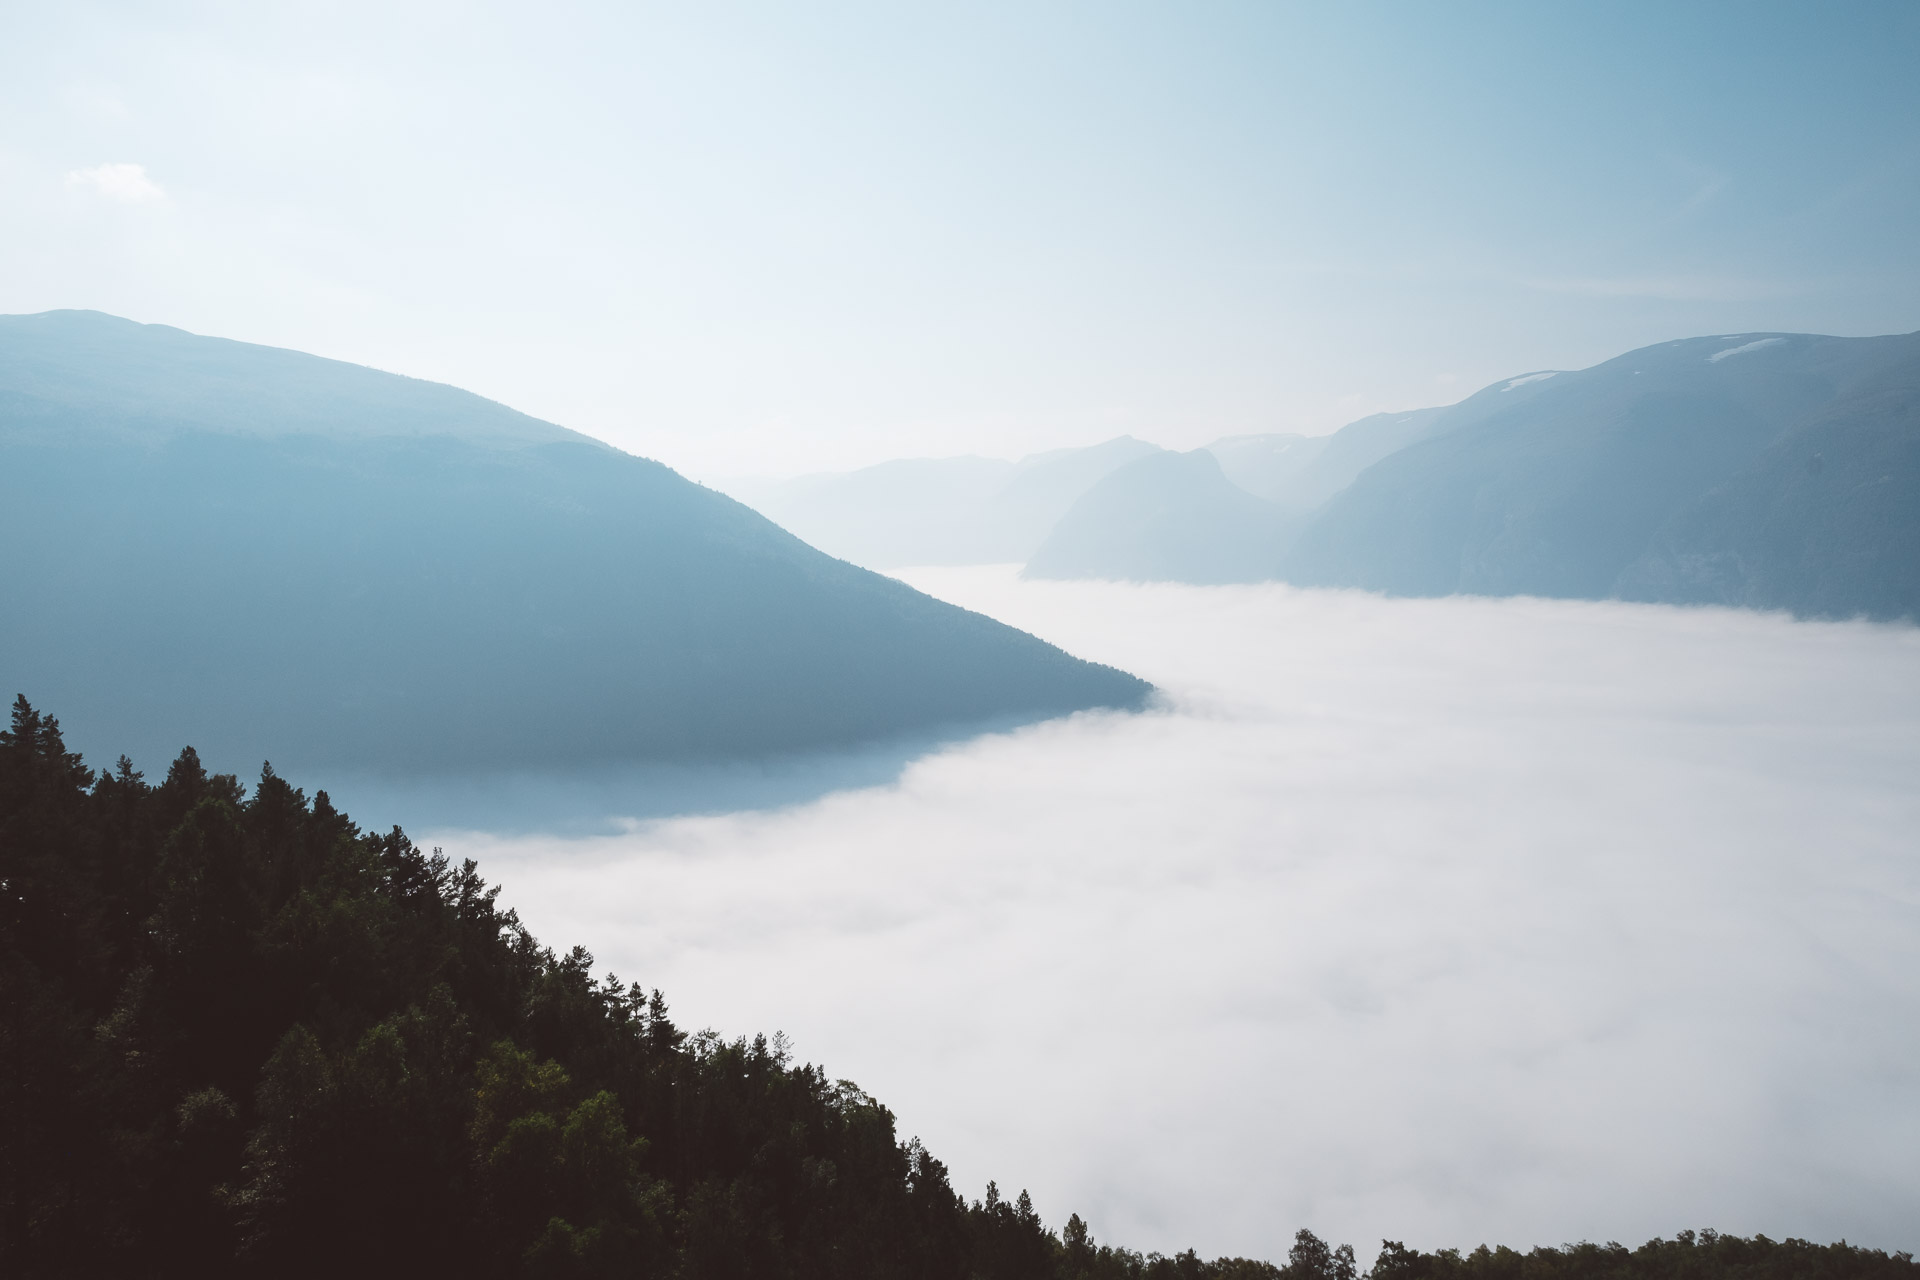 Stegastein, Aurlandsfjellet, Fjords, Norway, Sognefjord, Aurland, Laerdal